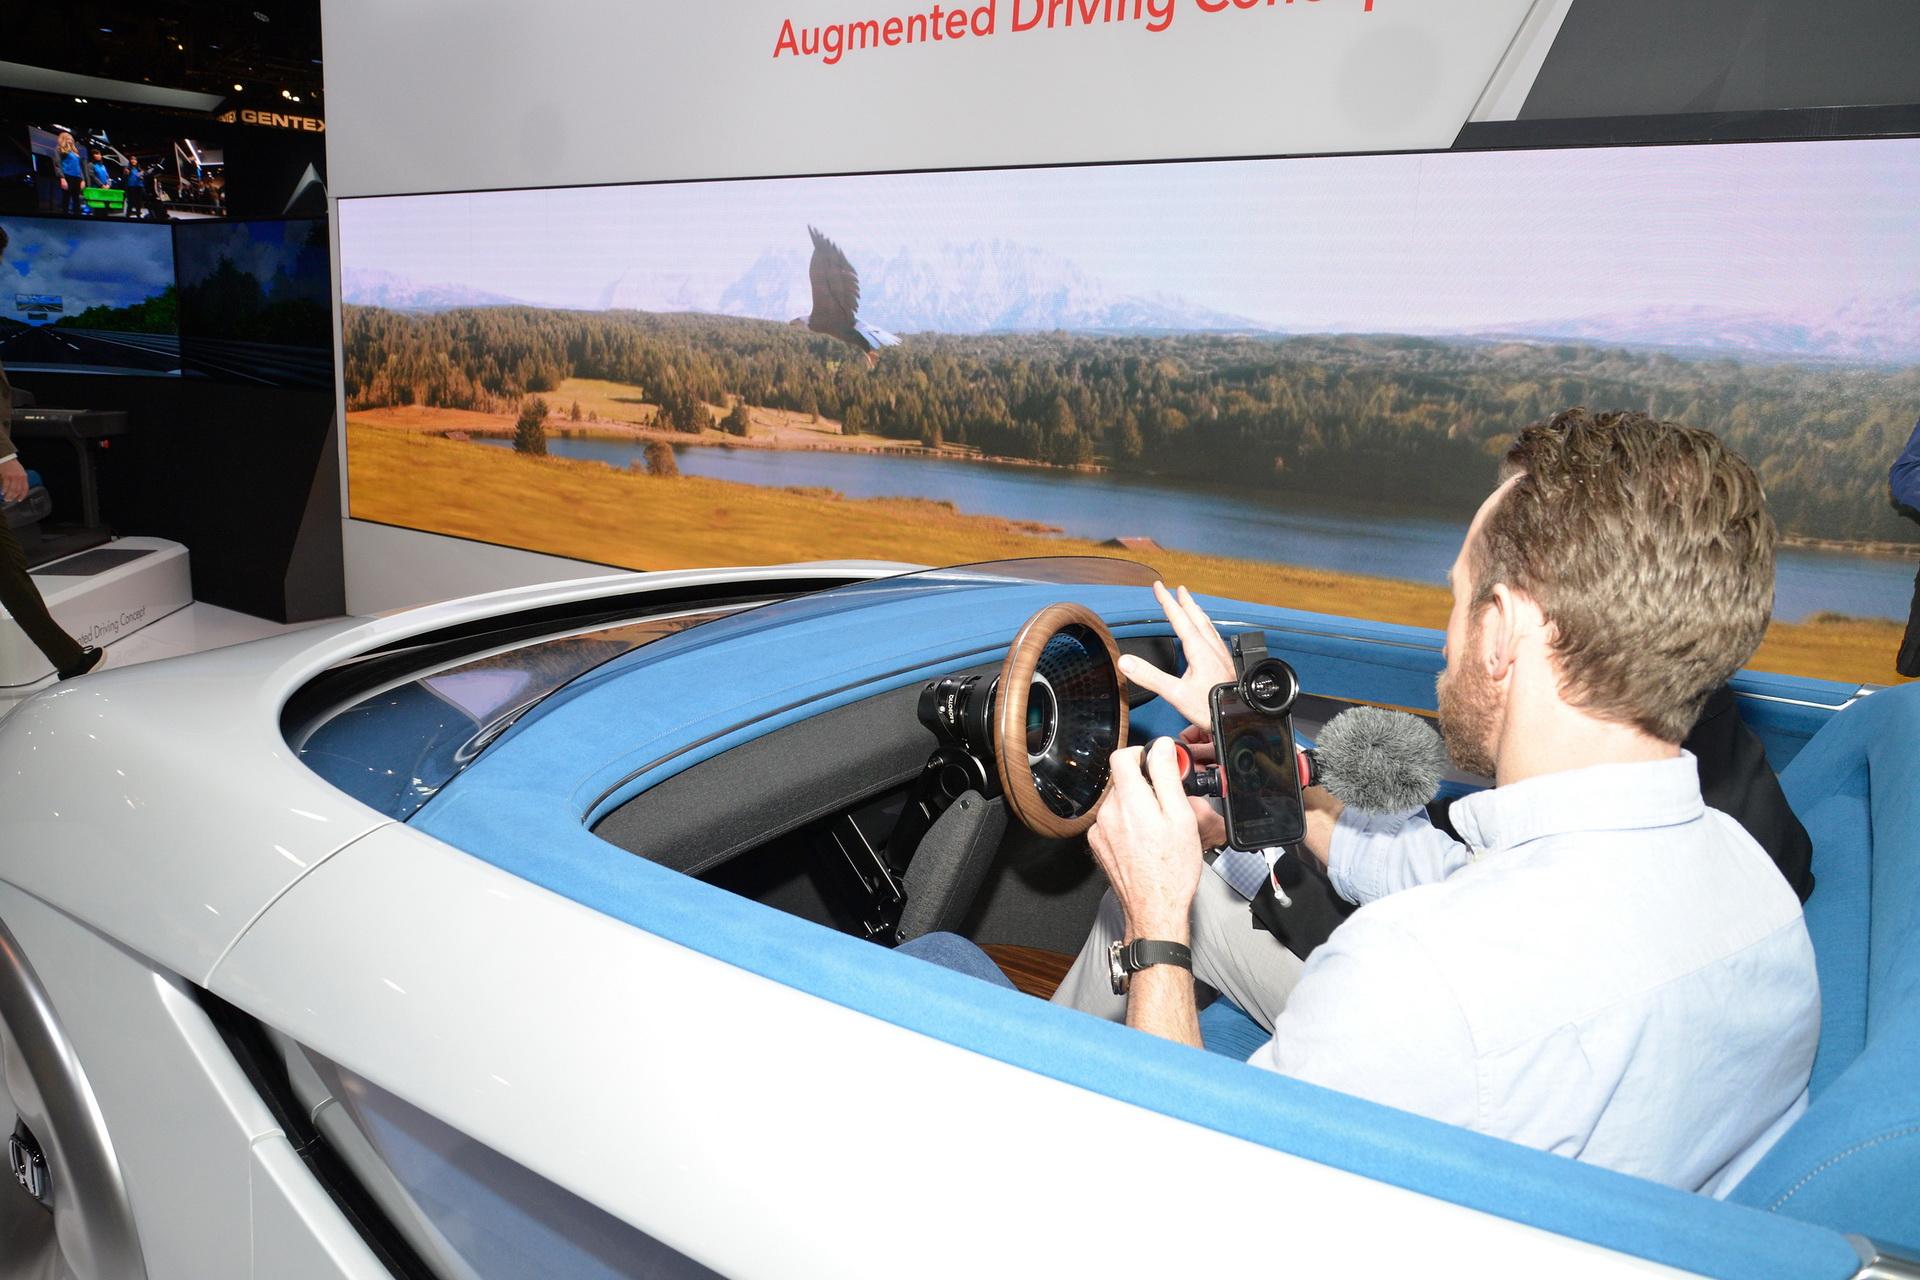 honda-augmented-driving-concept-ces-livepics-4.jpg